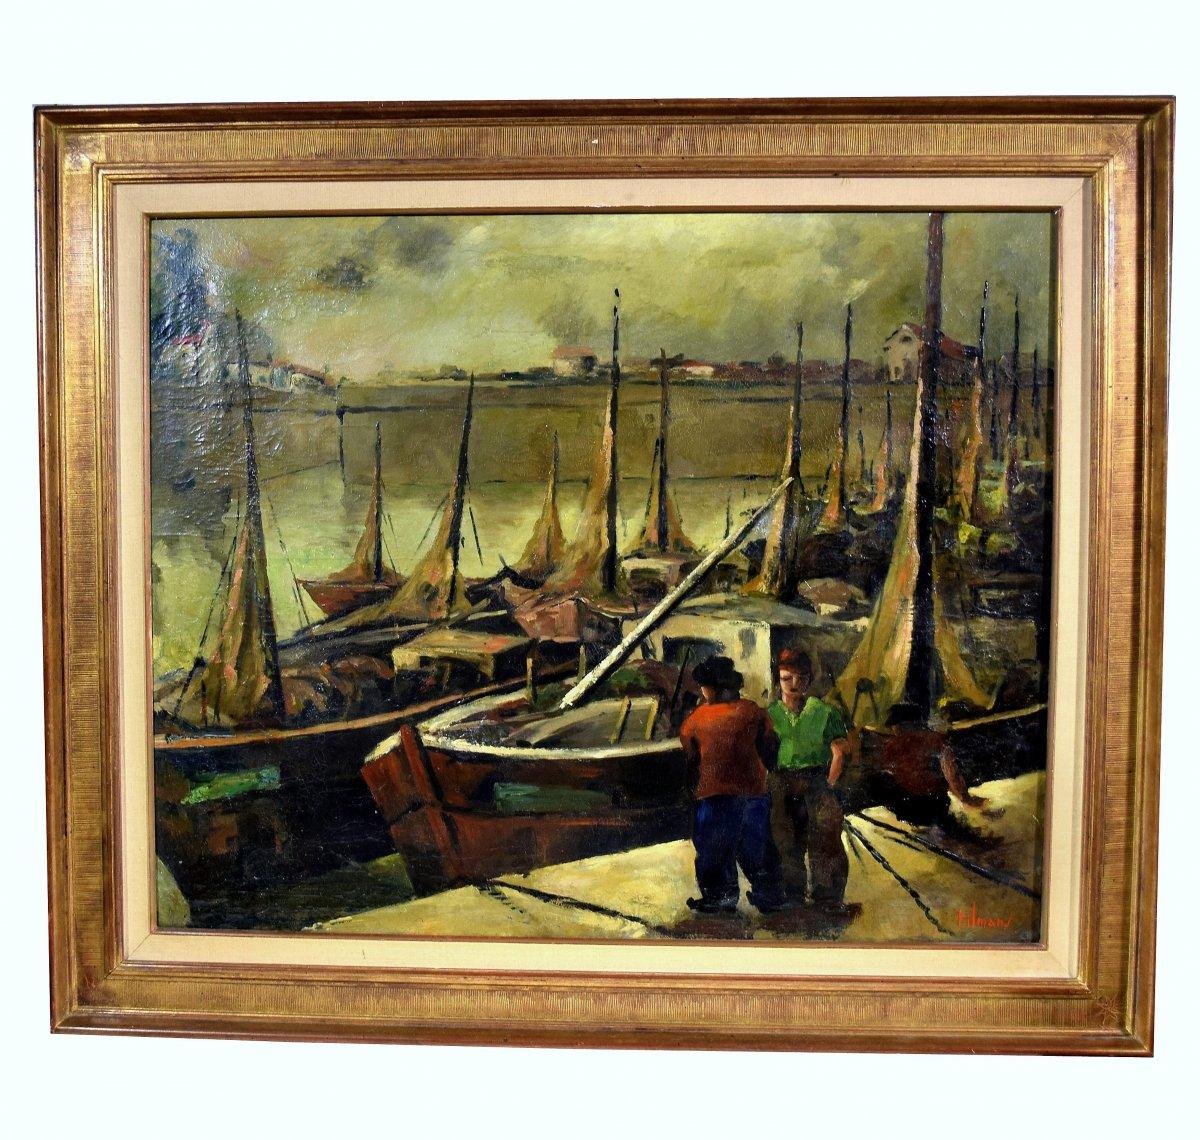 Fishing Port By Emile-henry Tilmans 1949